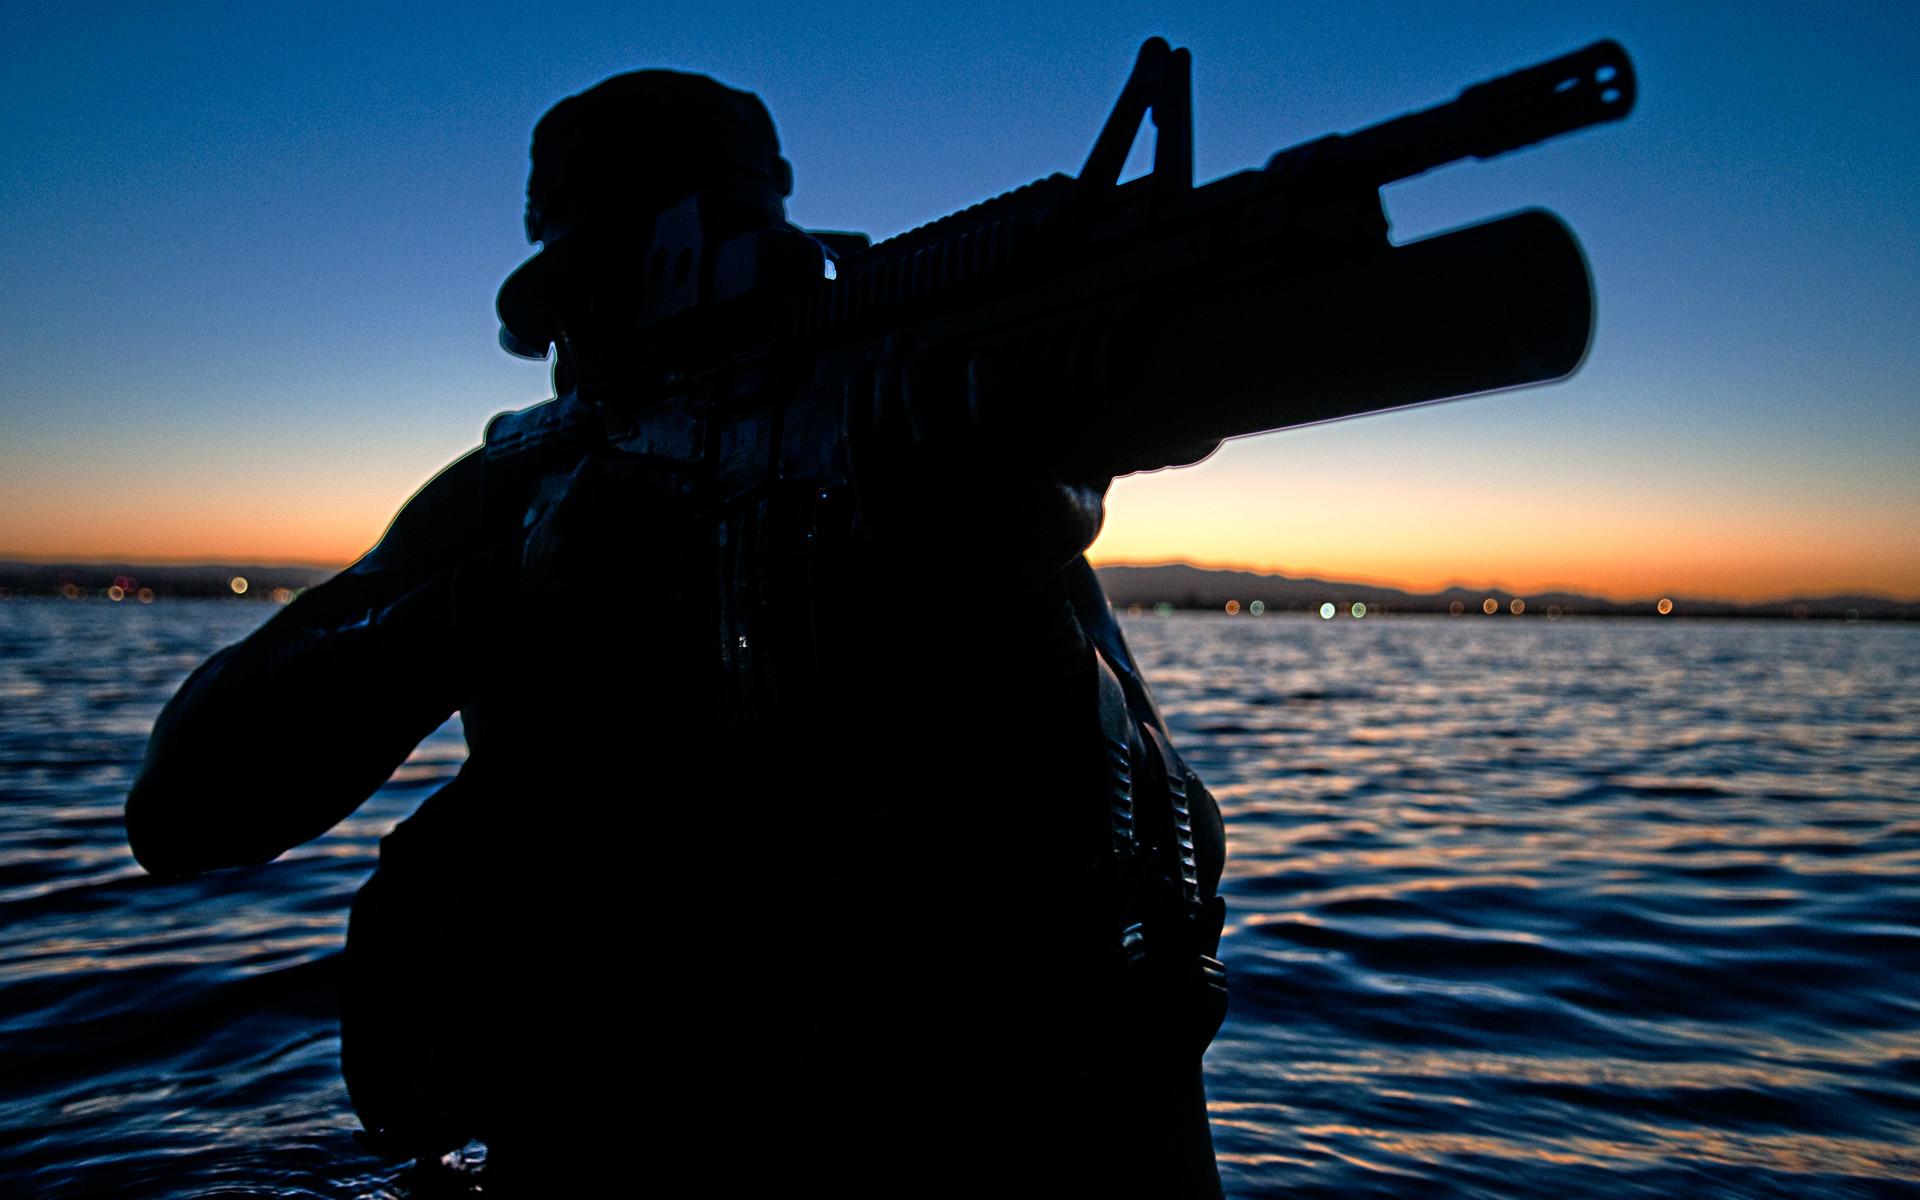 Navy Seals Wallpaper File:united states navy seals